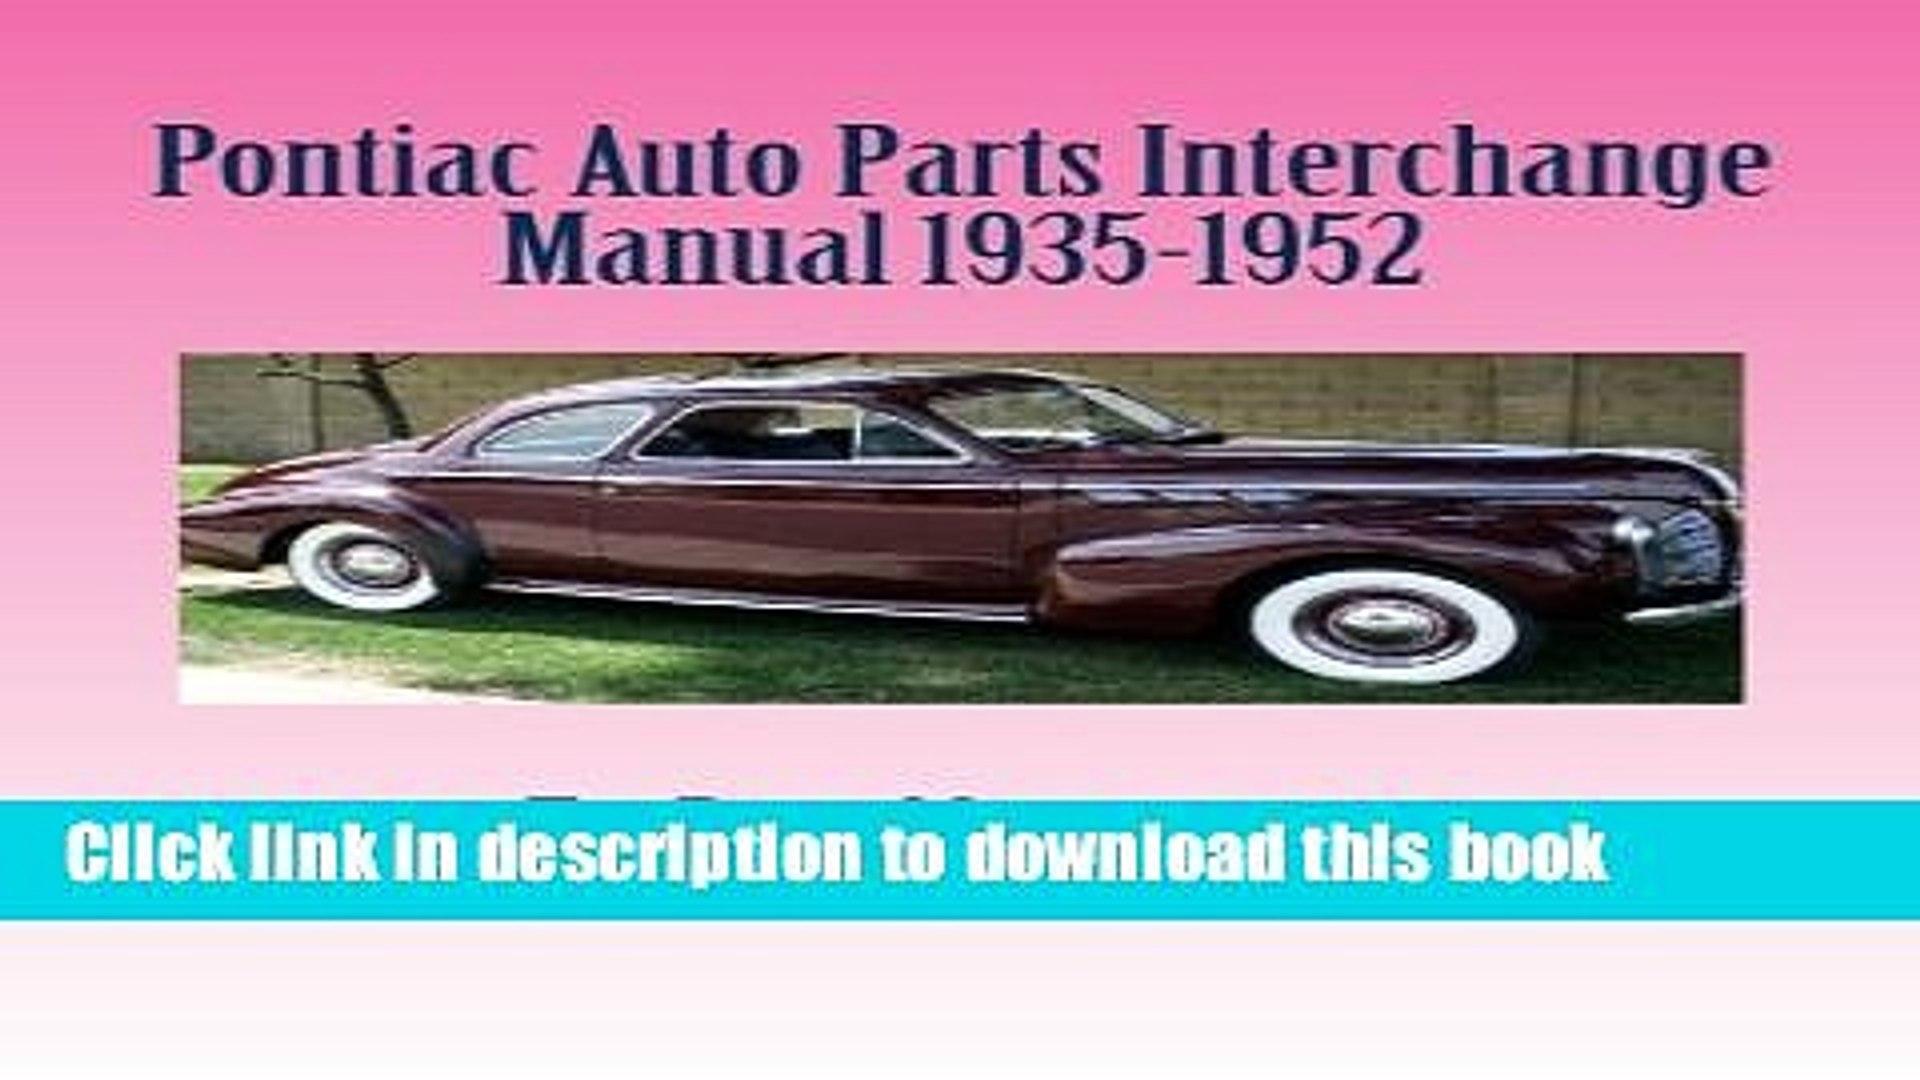 Auto Parts Interchange >> Pdf Pontiac Auto Parts Interchange Manual 1935 1952 Read Full Ebook